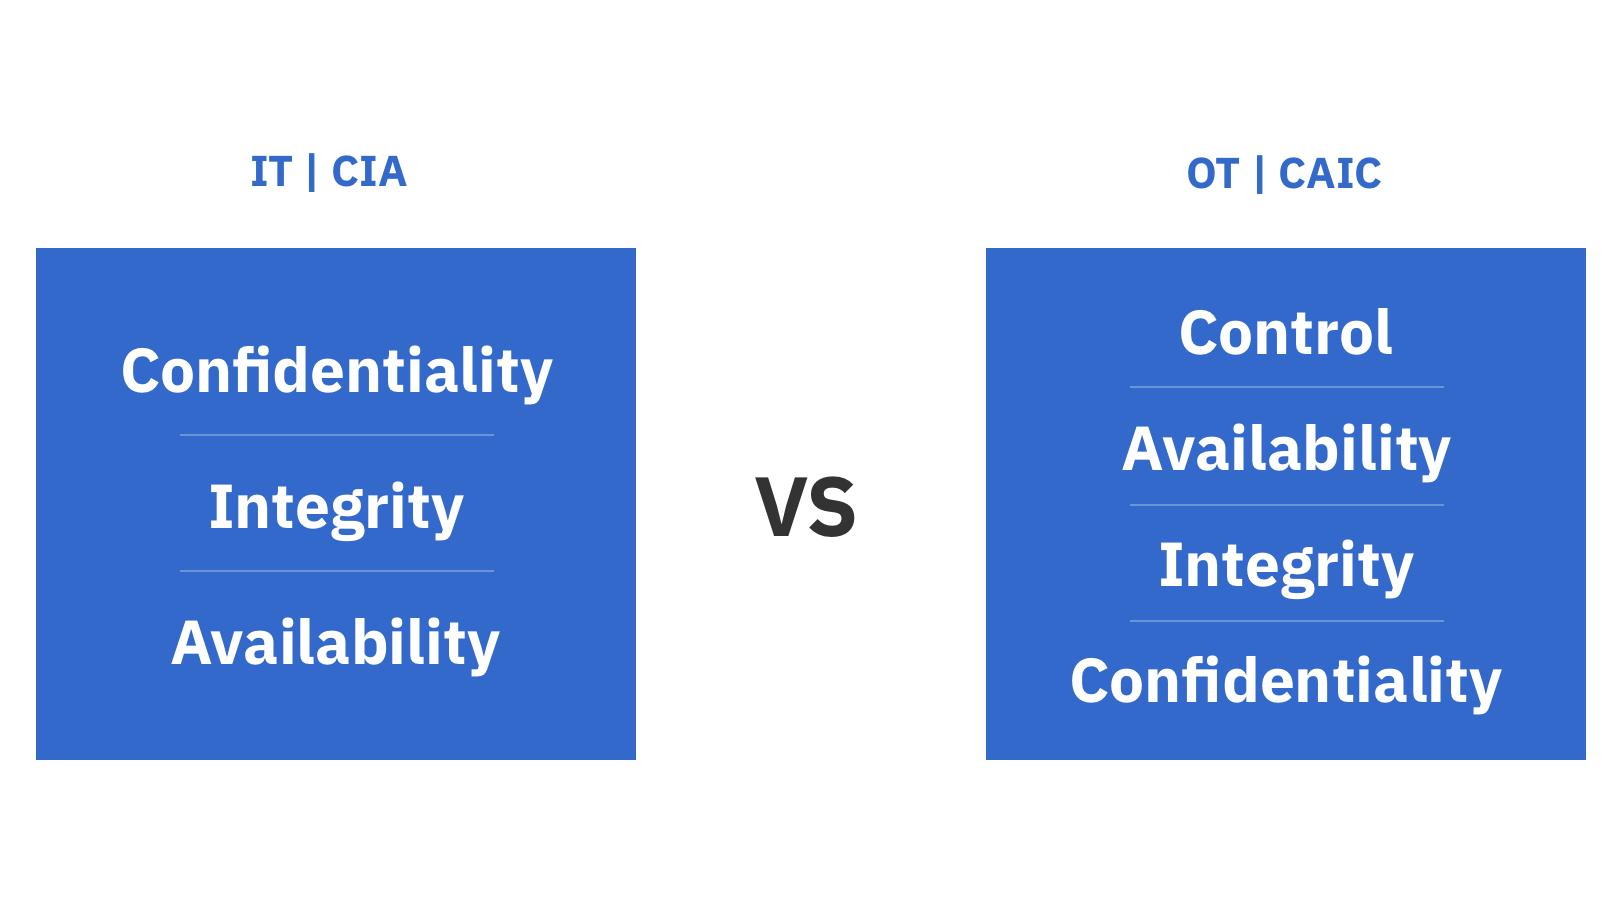 comparing IT models